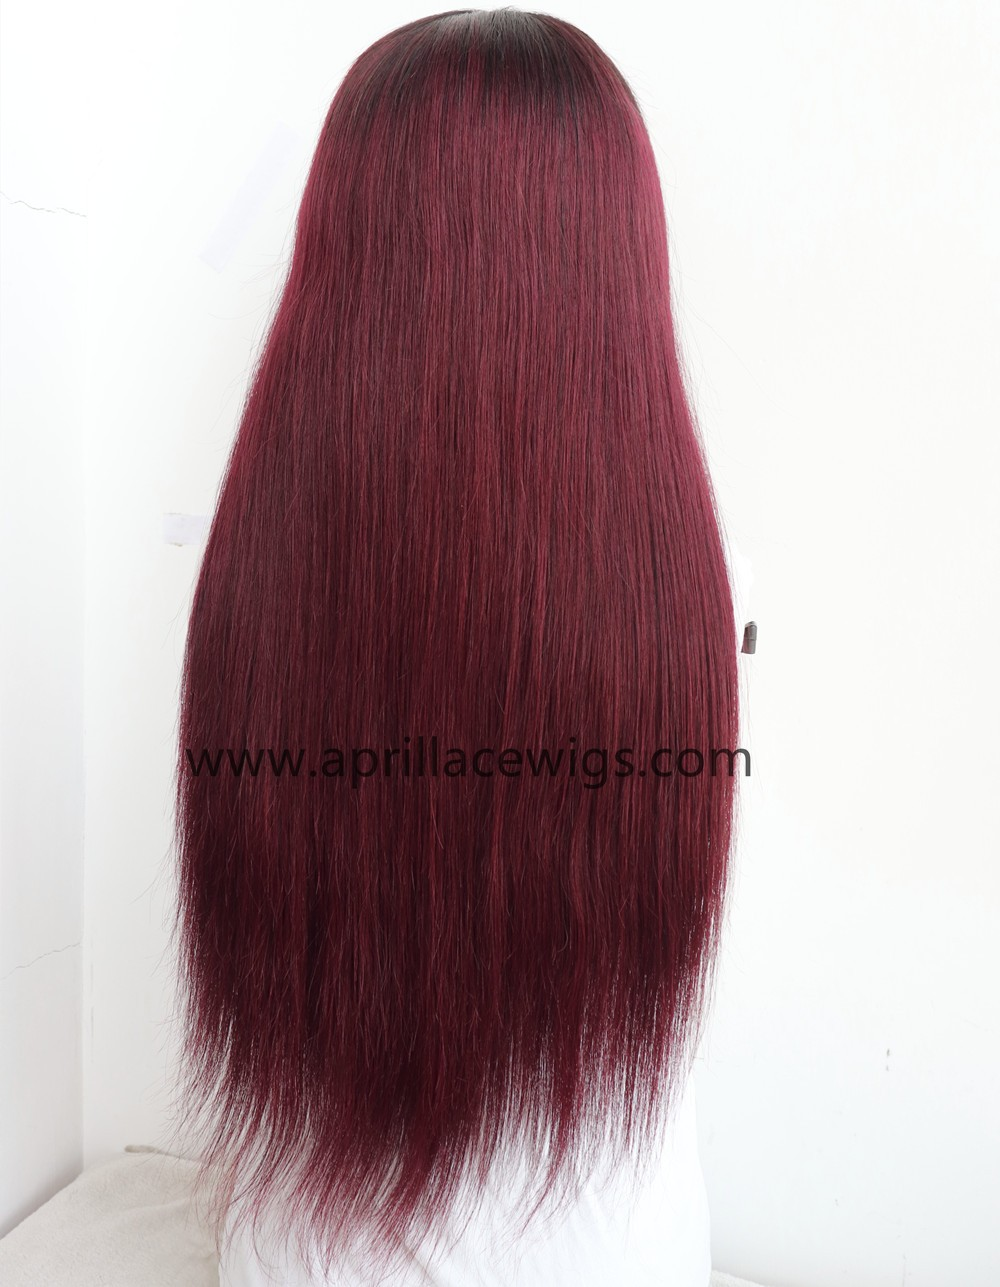 Malaysian virgin human hair color 1b/99J Glueless 13x6 Lace Front wig